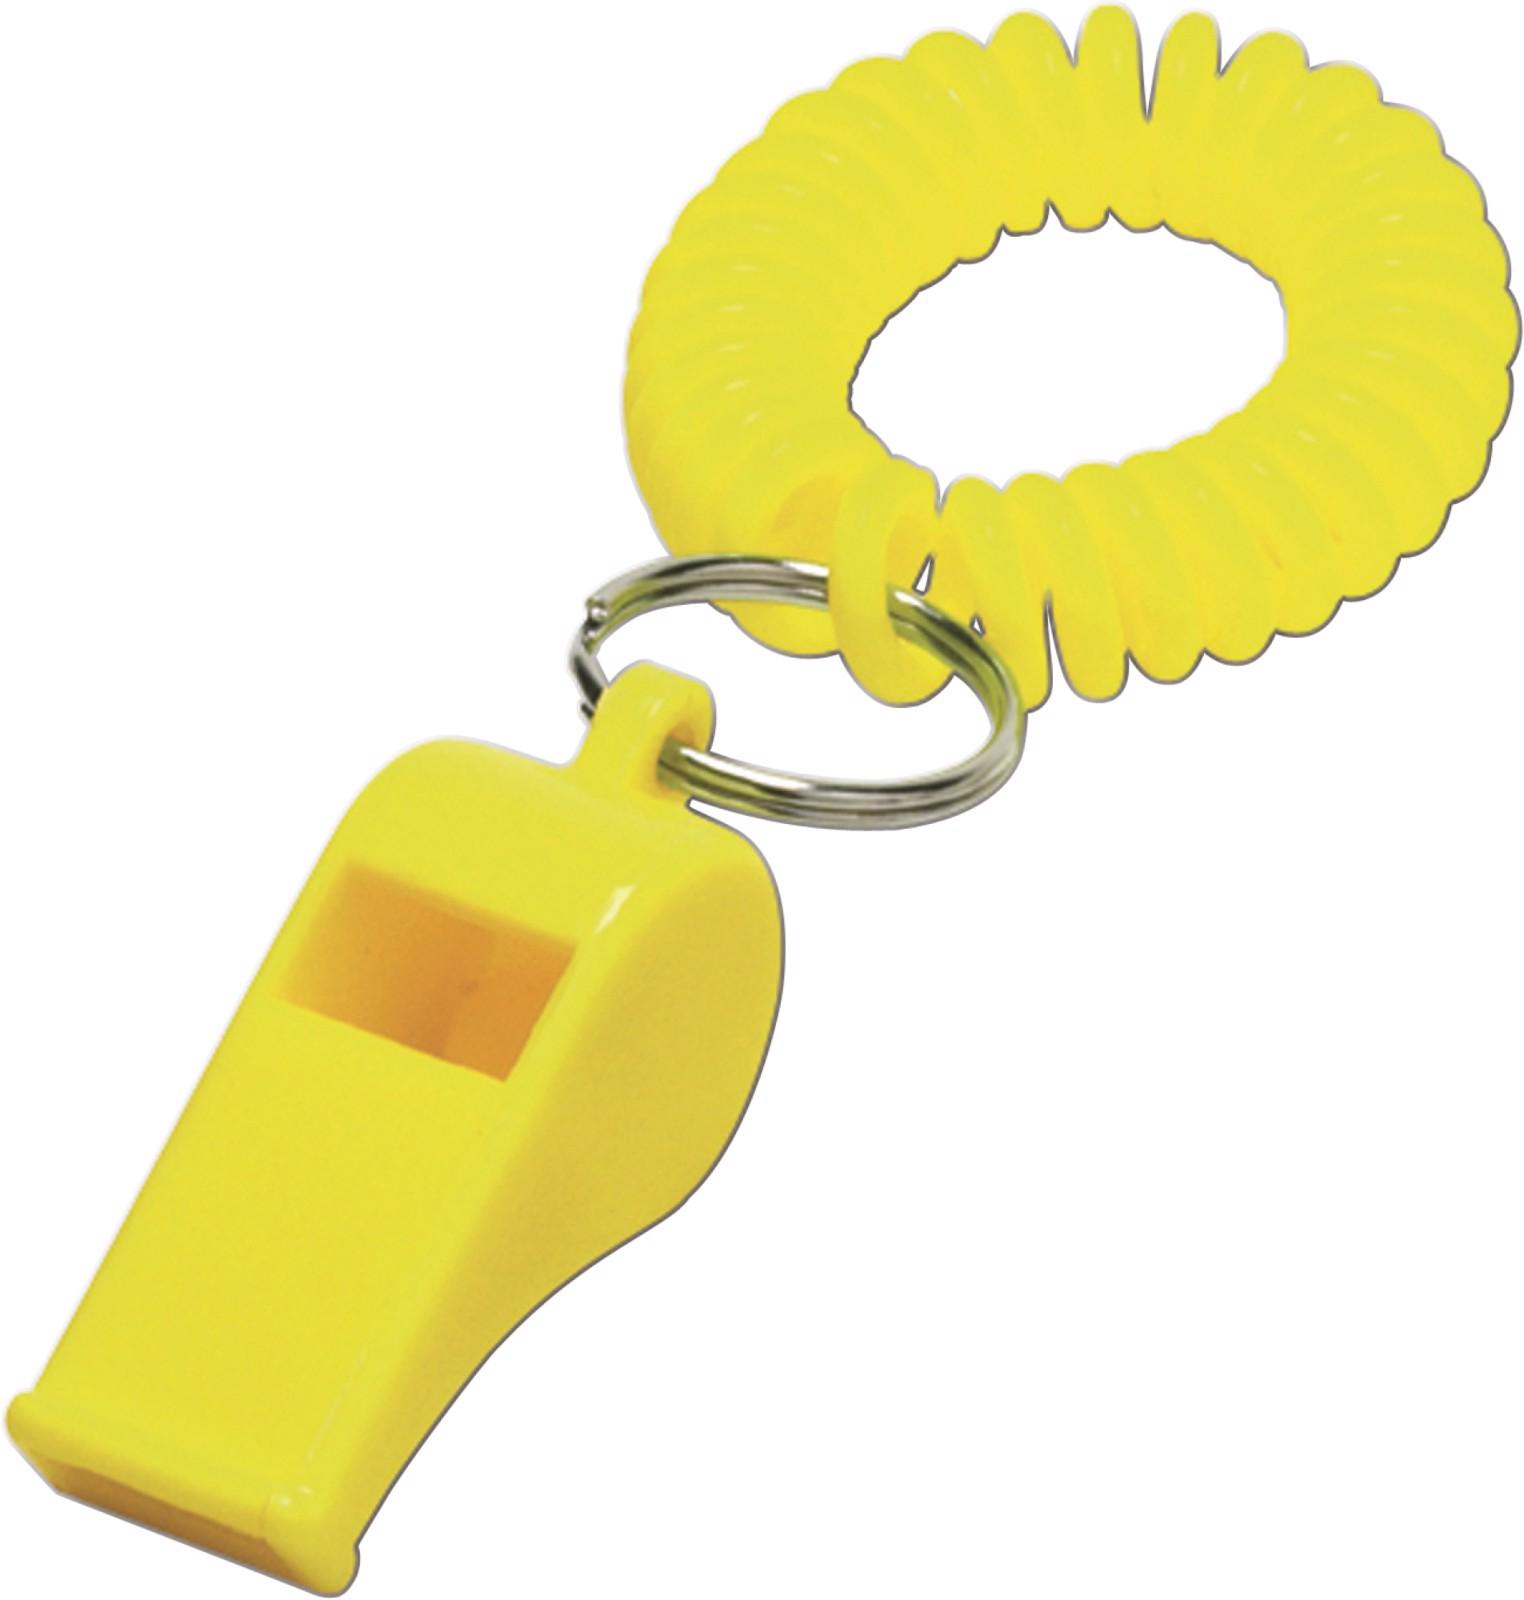 ABS whistle - Yellow